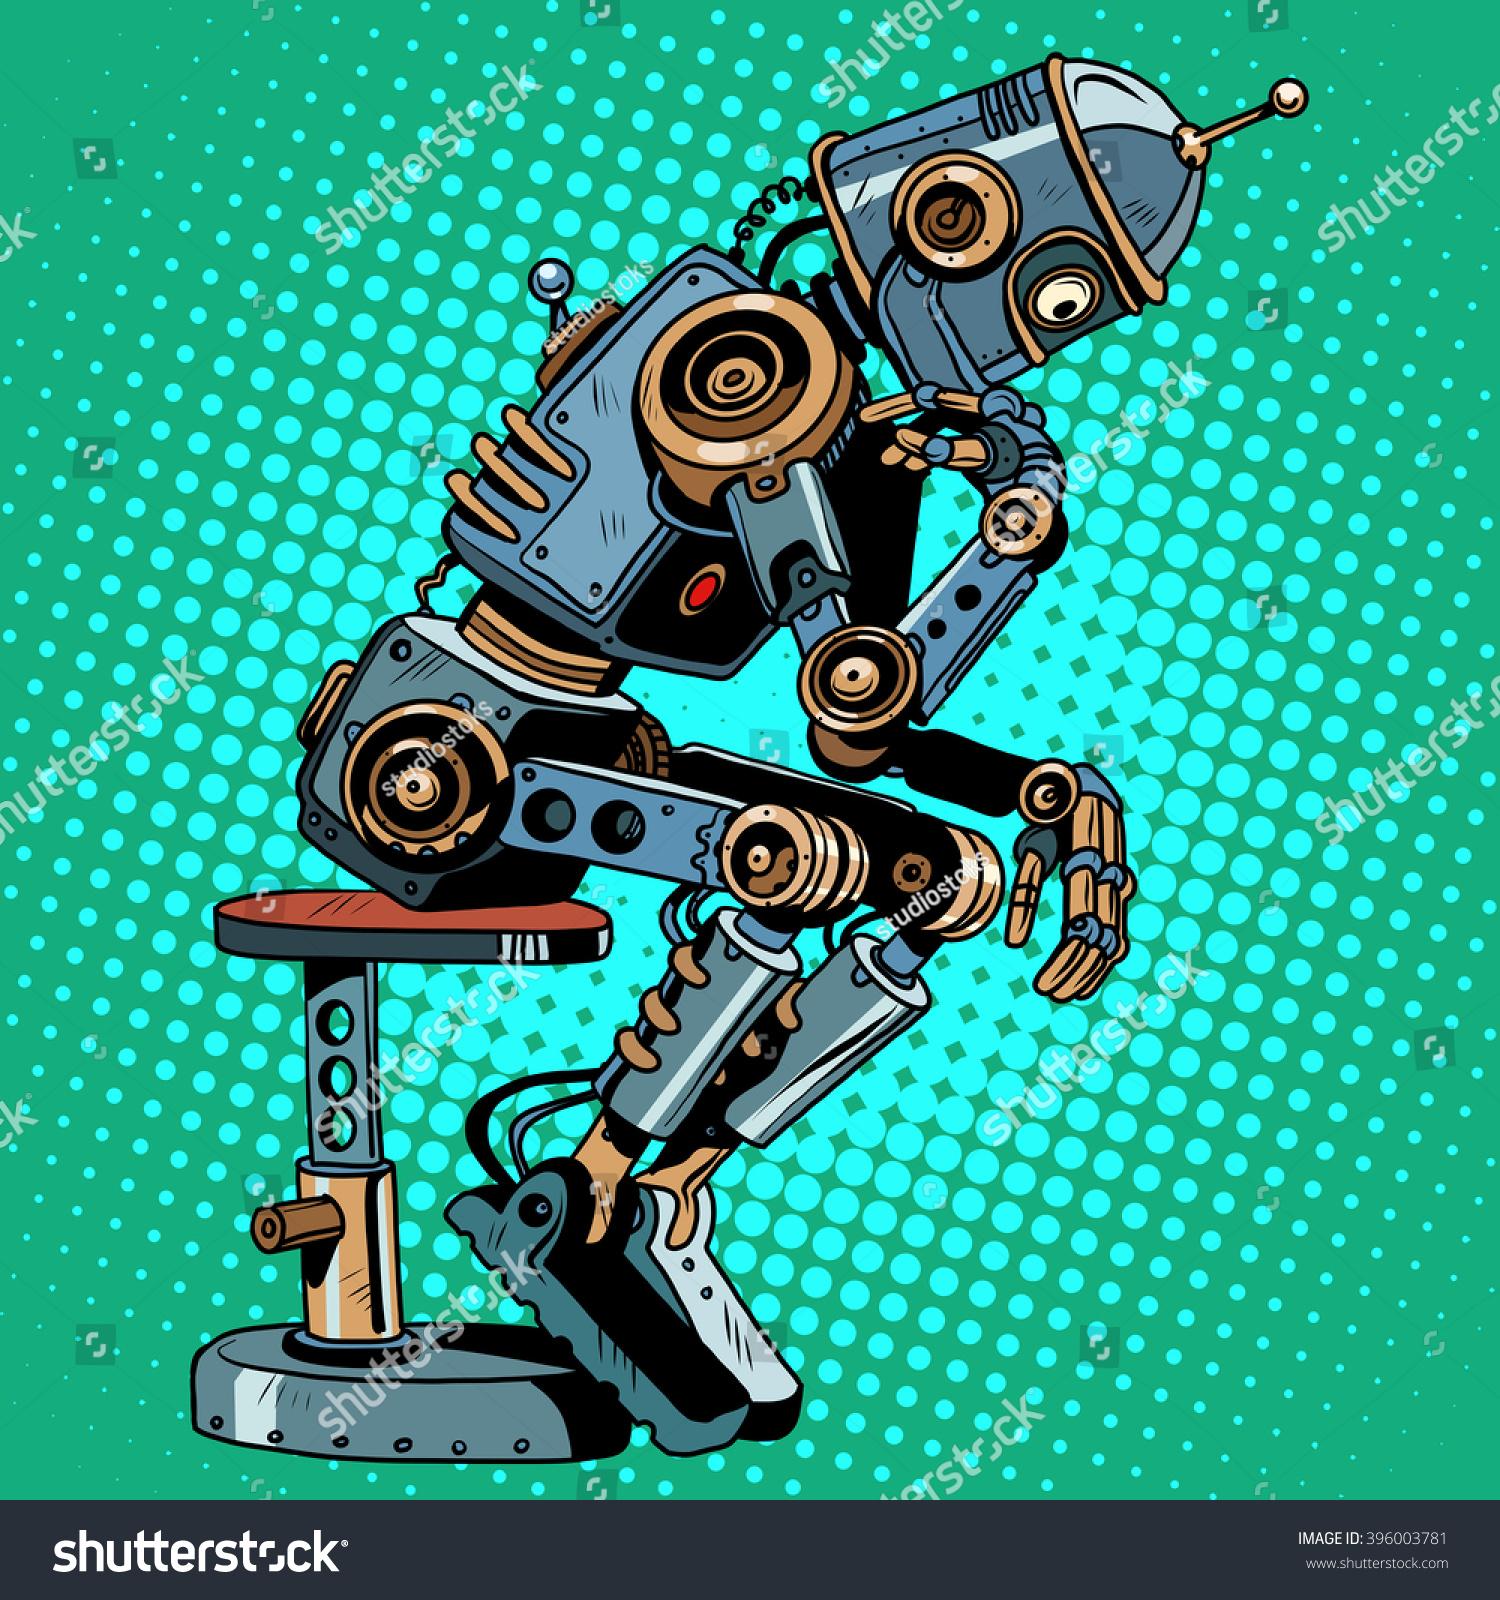 Robot Thinker Artificial Intelligence Progress Stock Vector ...